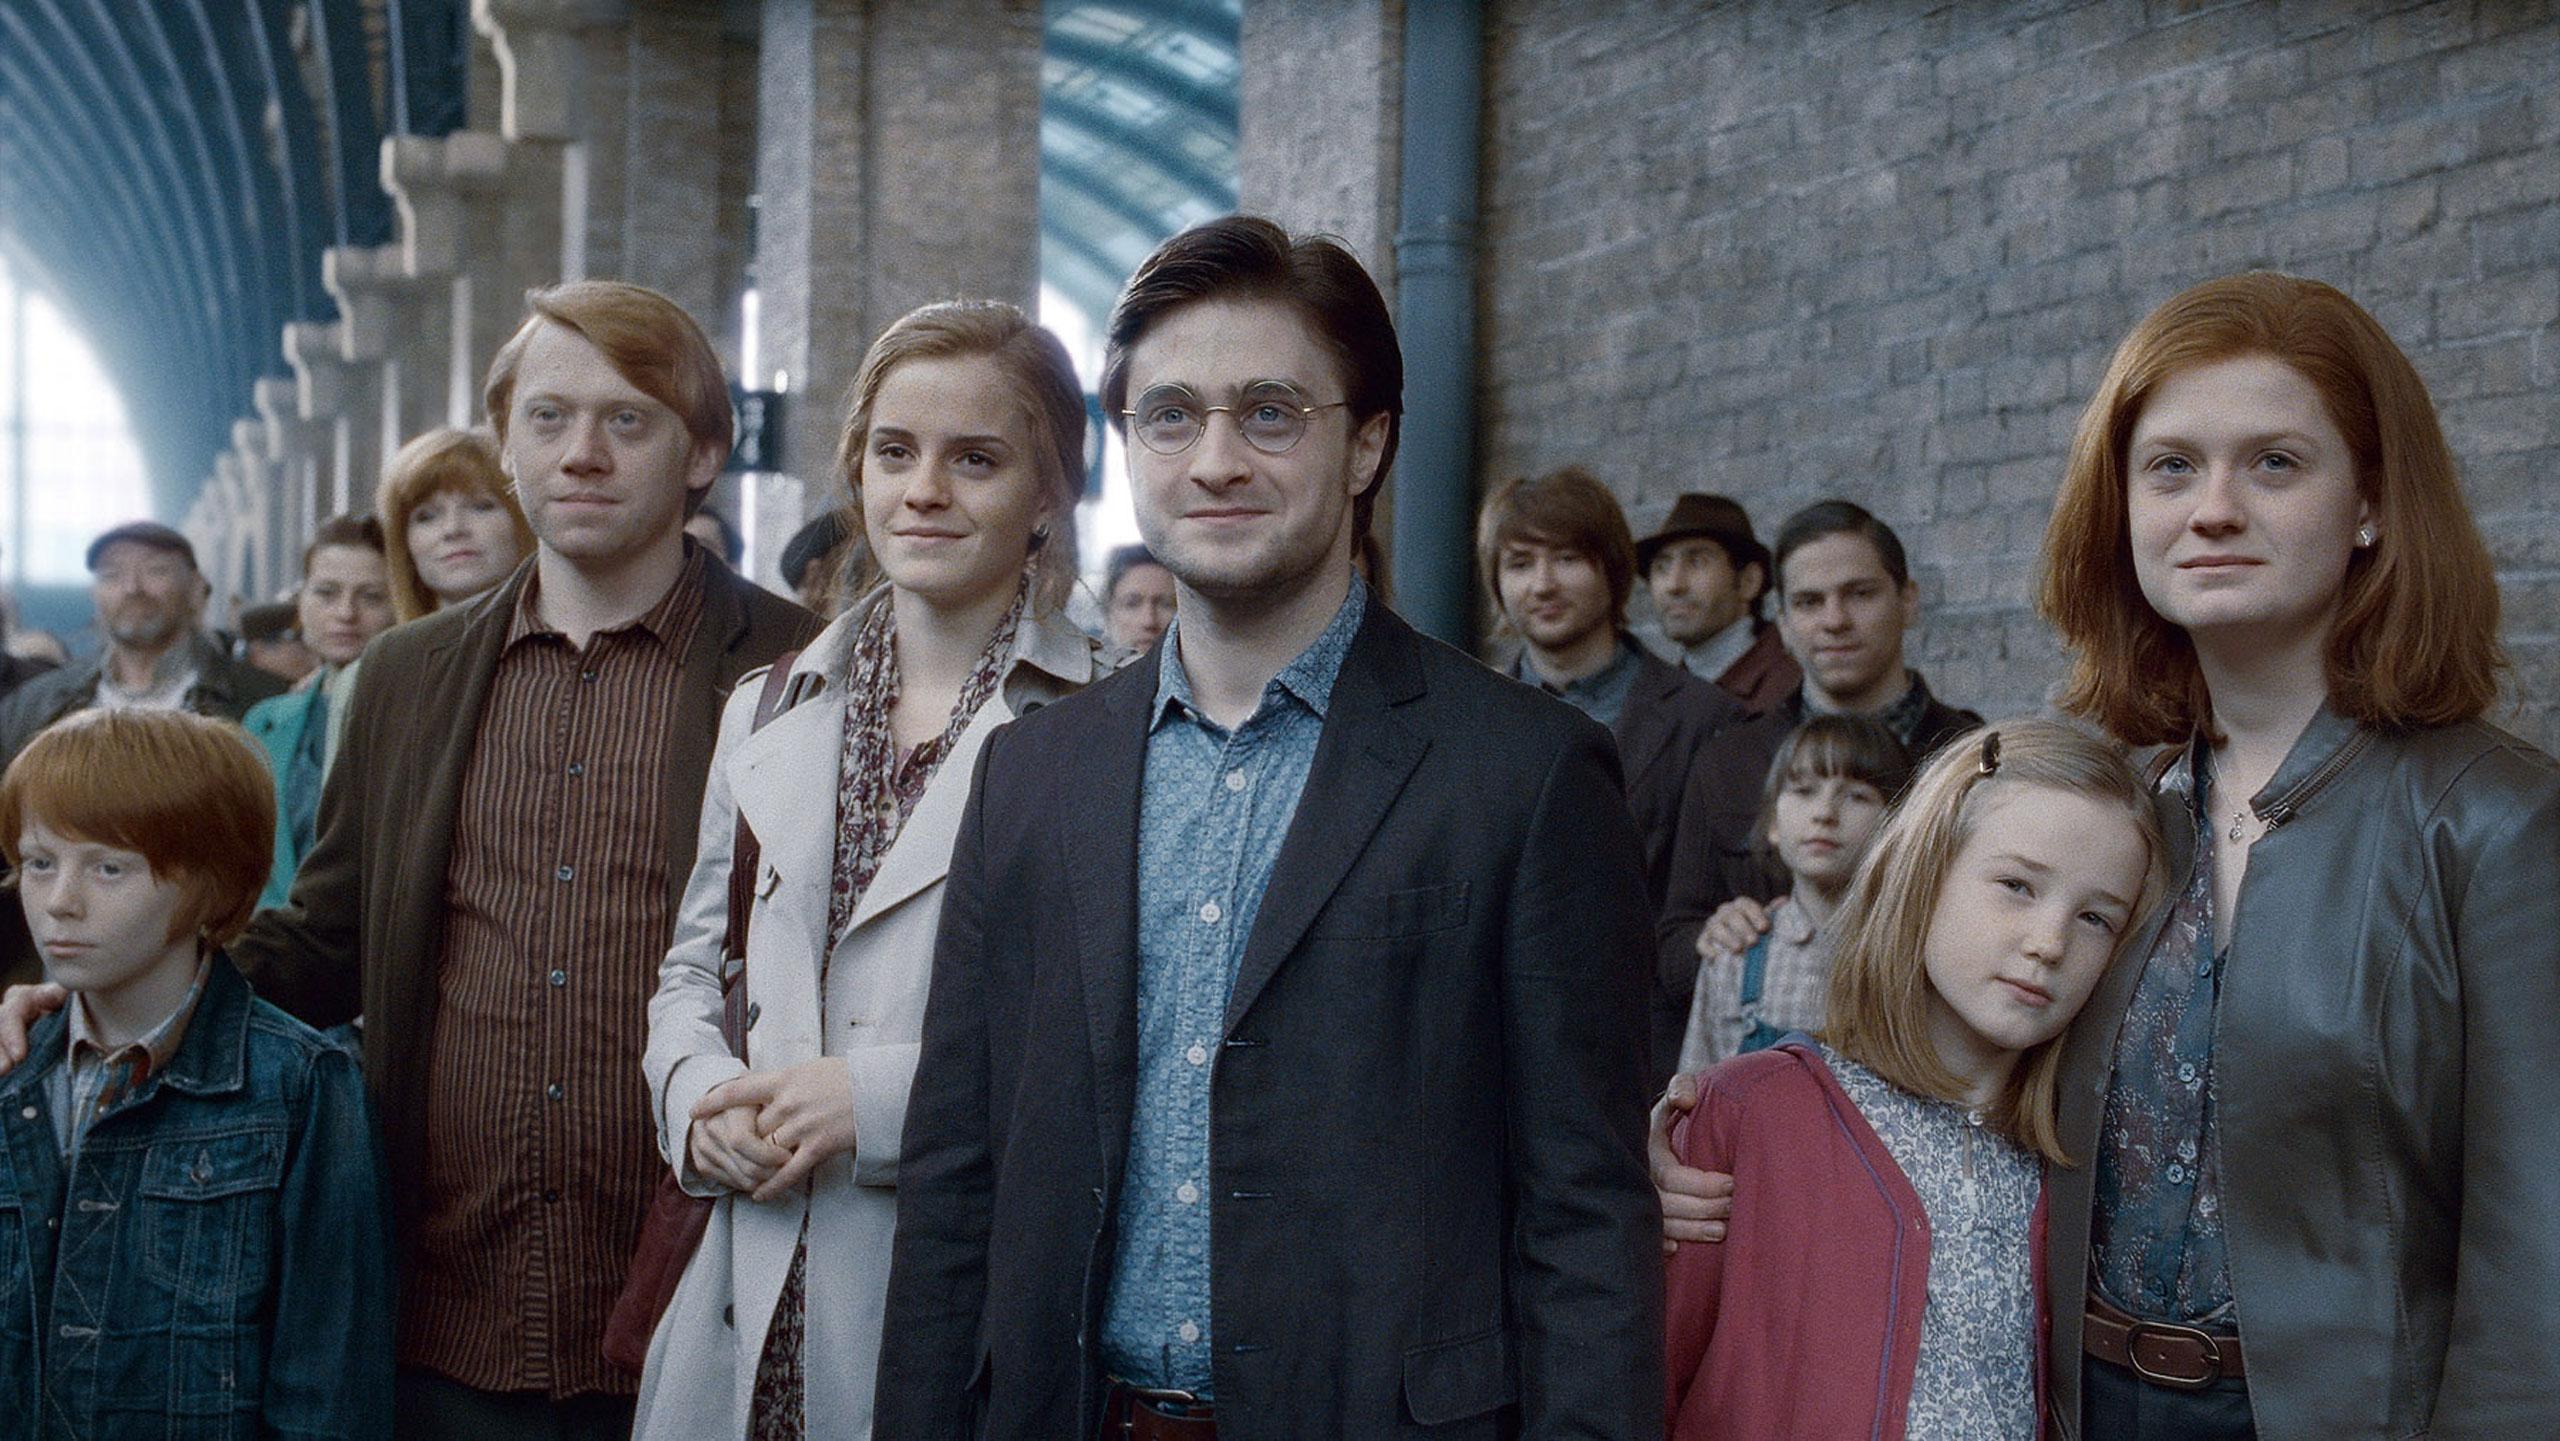 Harry Potter Hermione Granger Ron Weasley Old